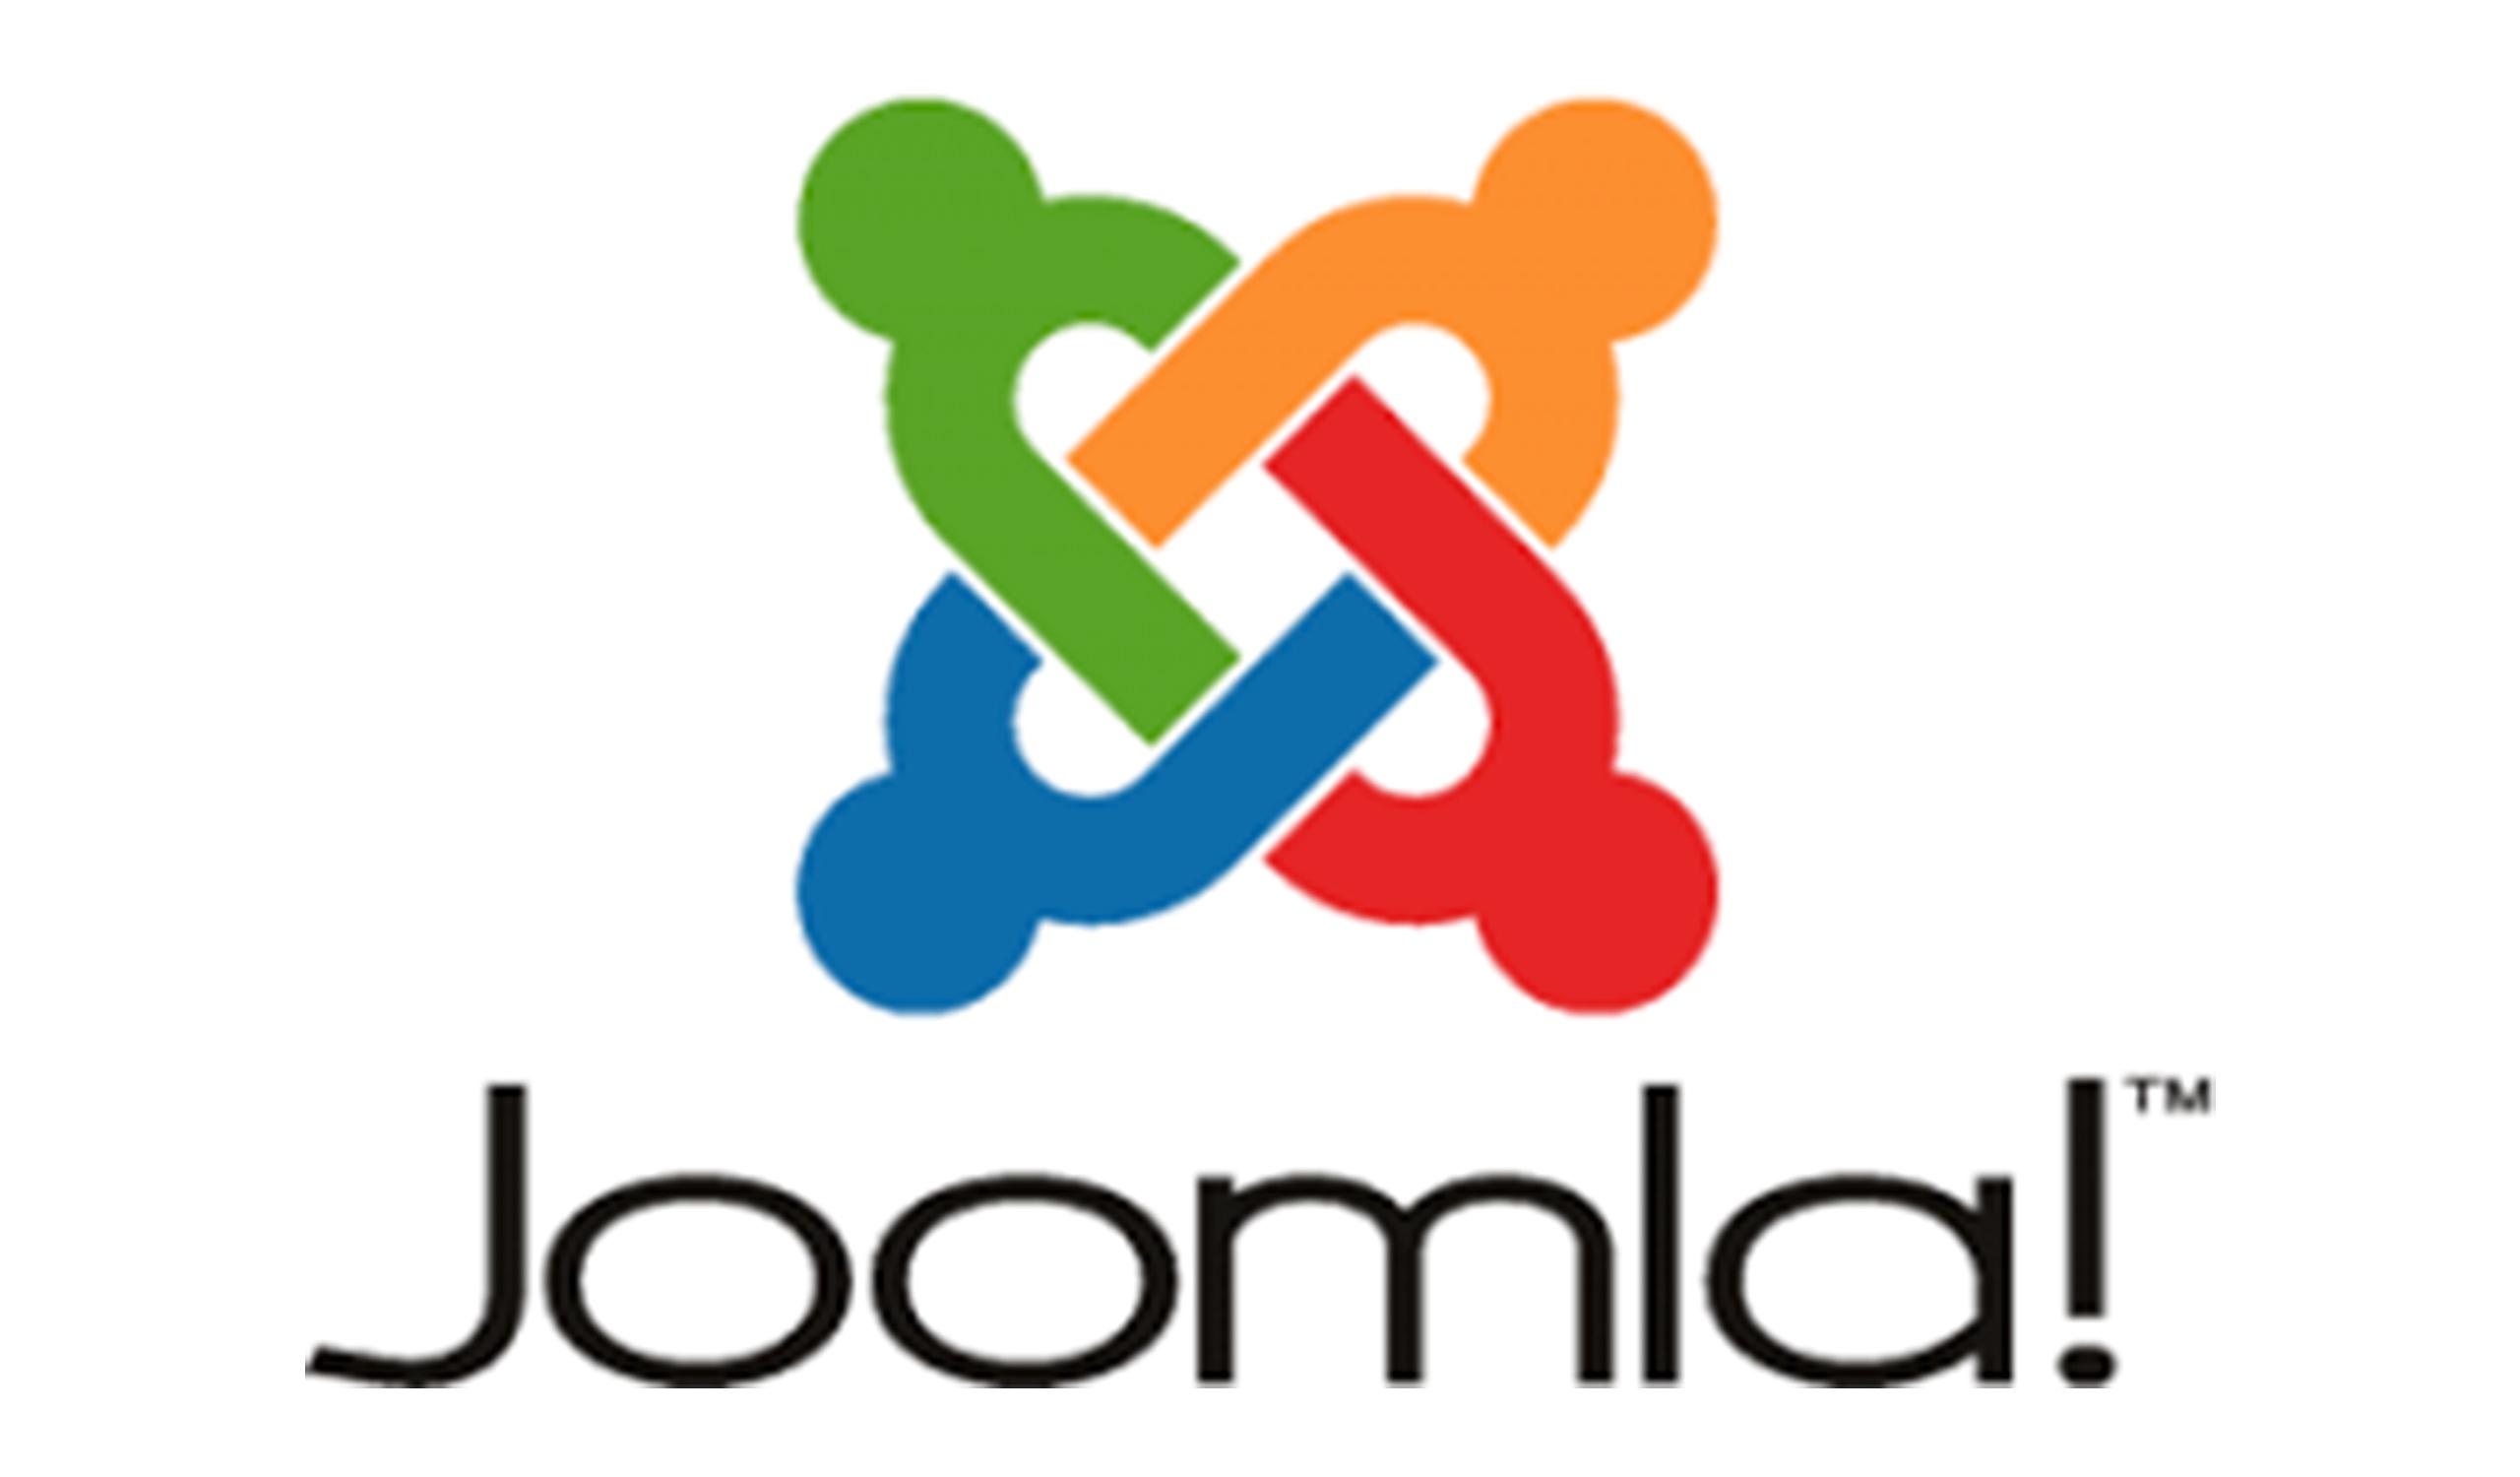 cuckhoo-web-design-digital-marketing-industry-skills-joomla